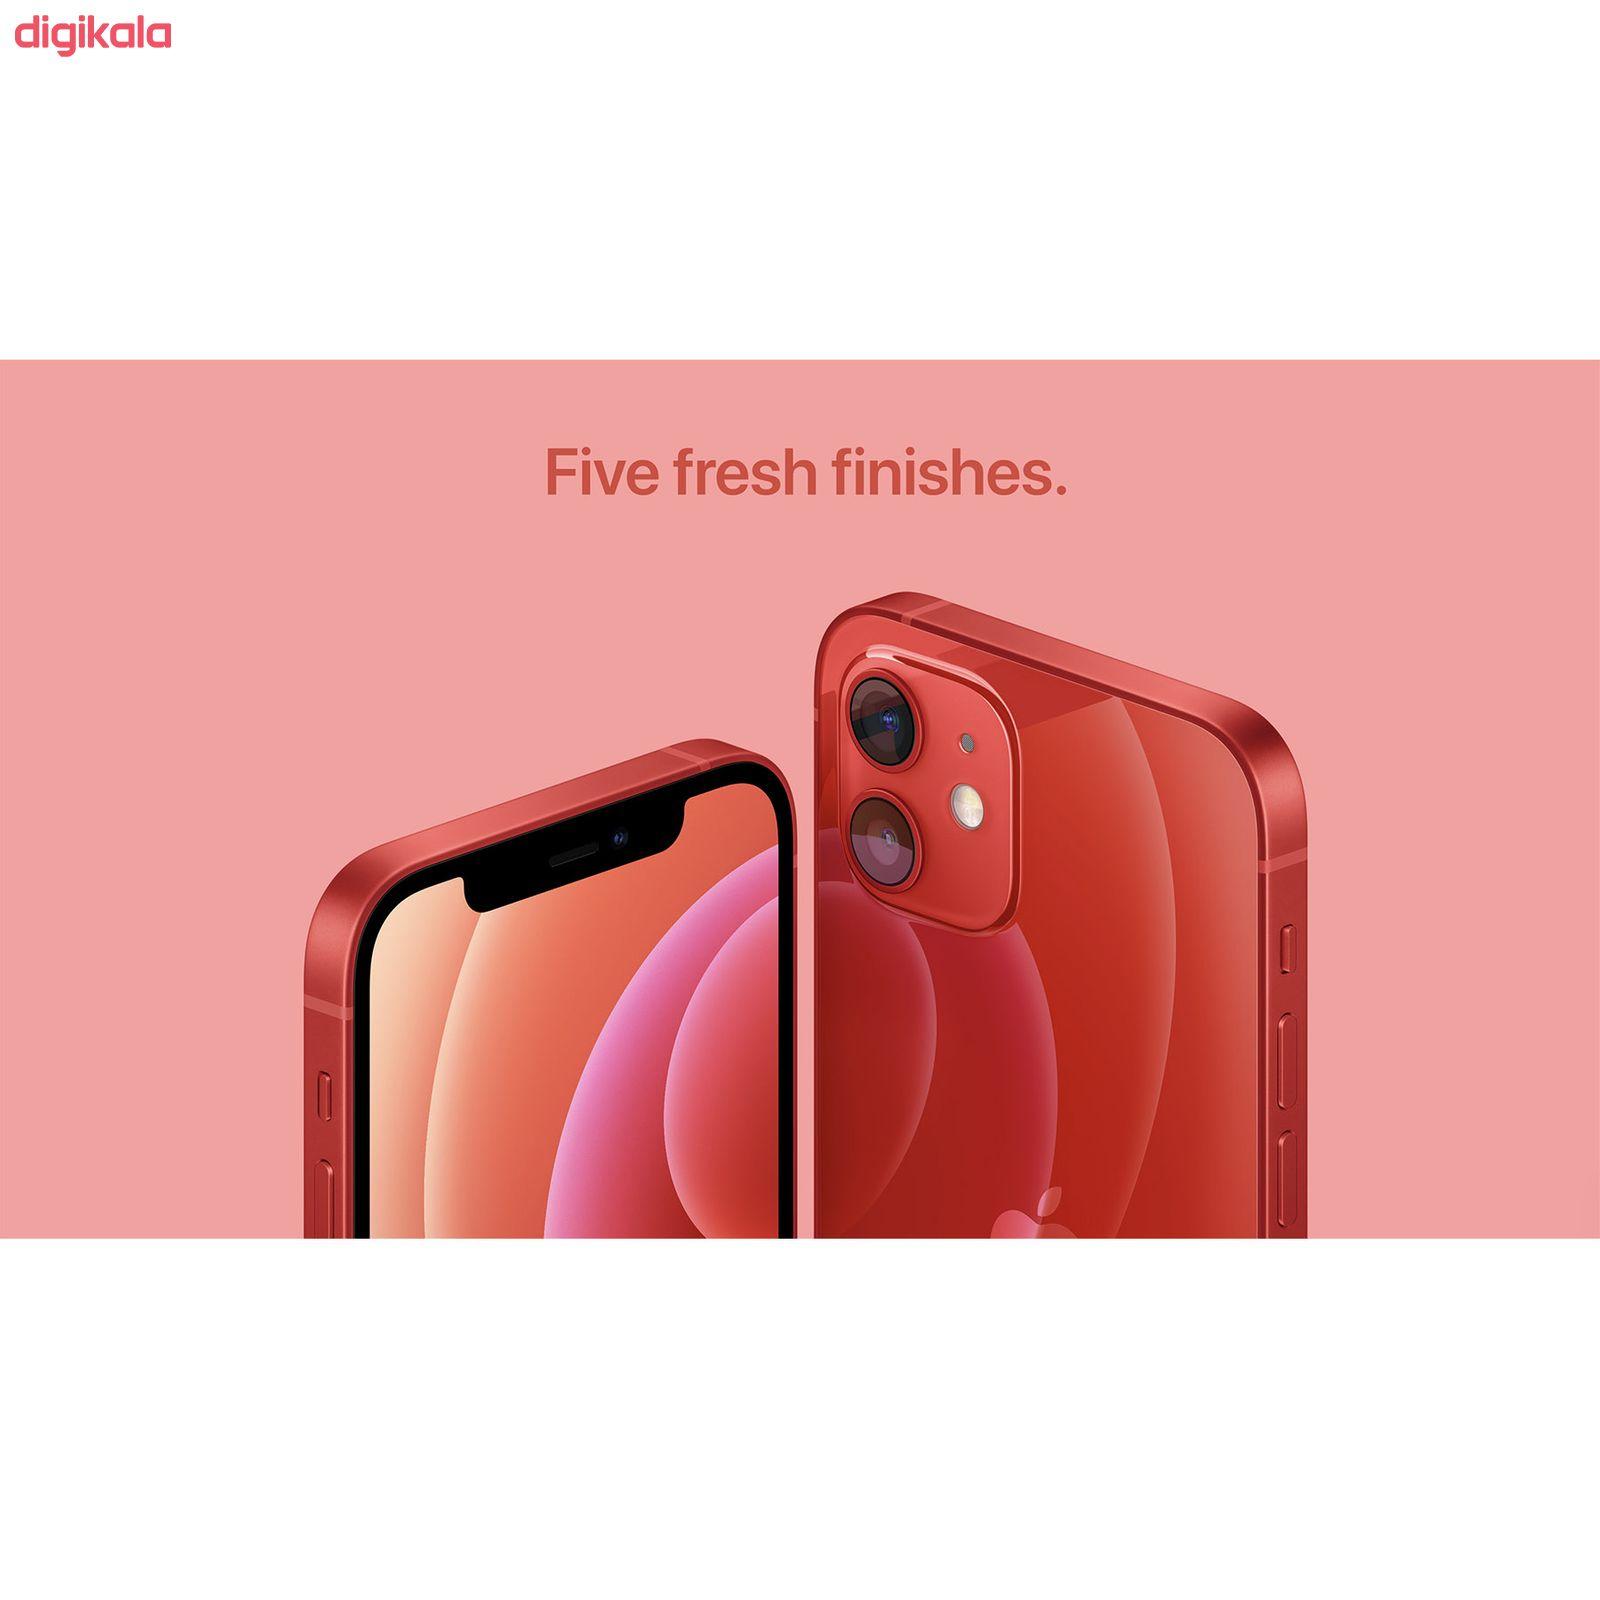 گوشی موبایل اپل مدل iPhone 12 A2404 دو سیم کارت ظرفیت 256 گیگابایت  main 1 10